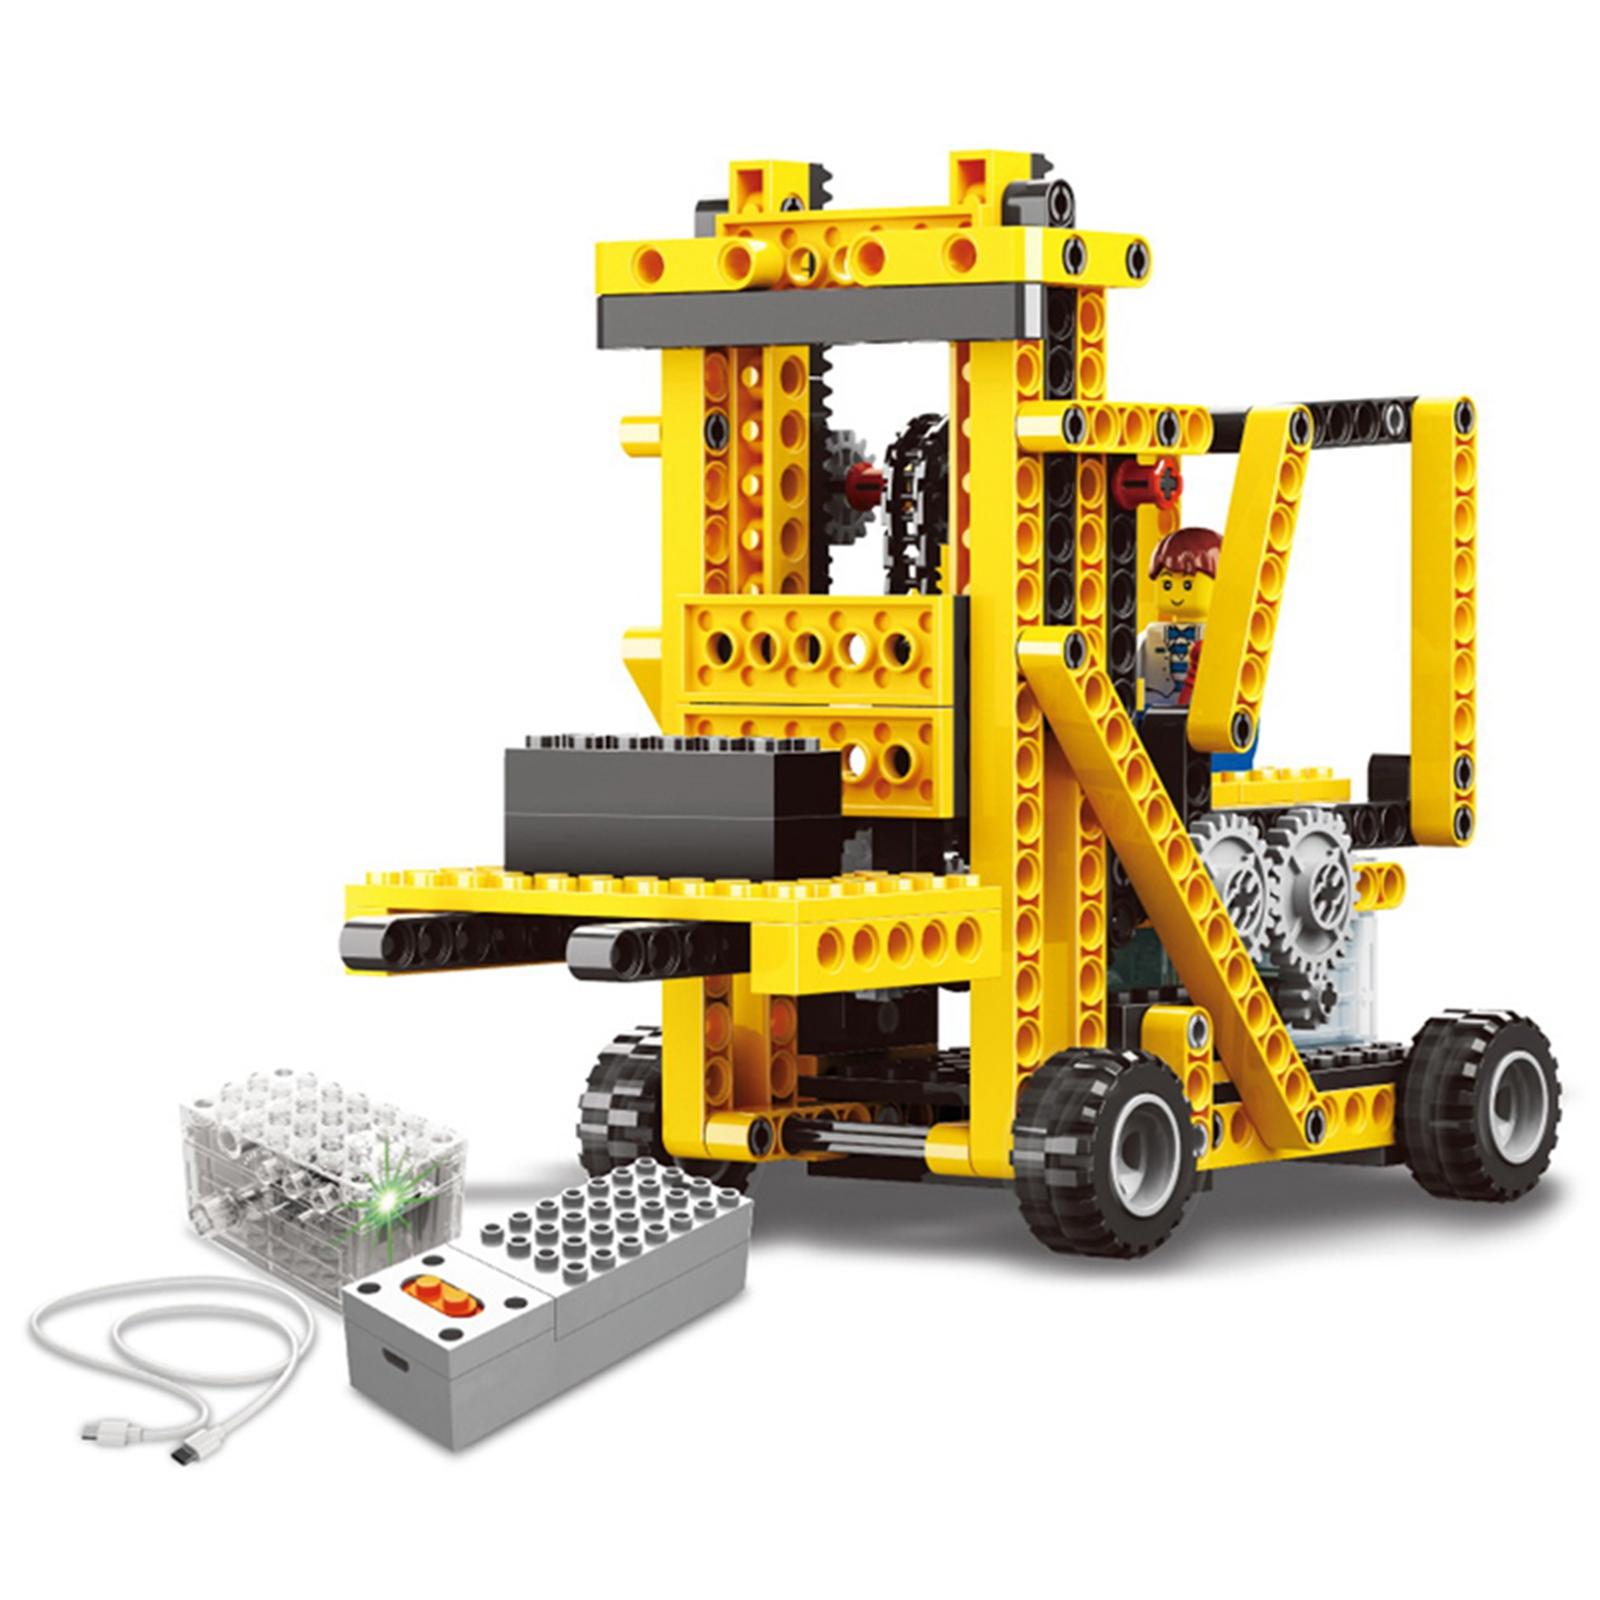 292PCS Machinery Series Electric Plastic Building Blocks ...